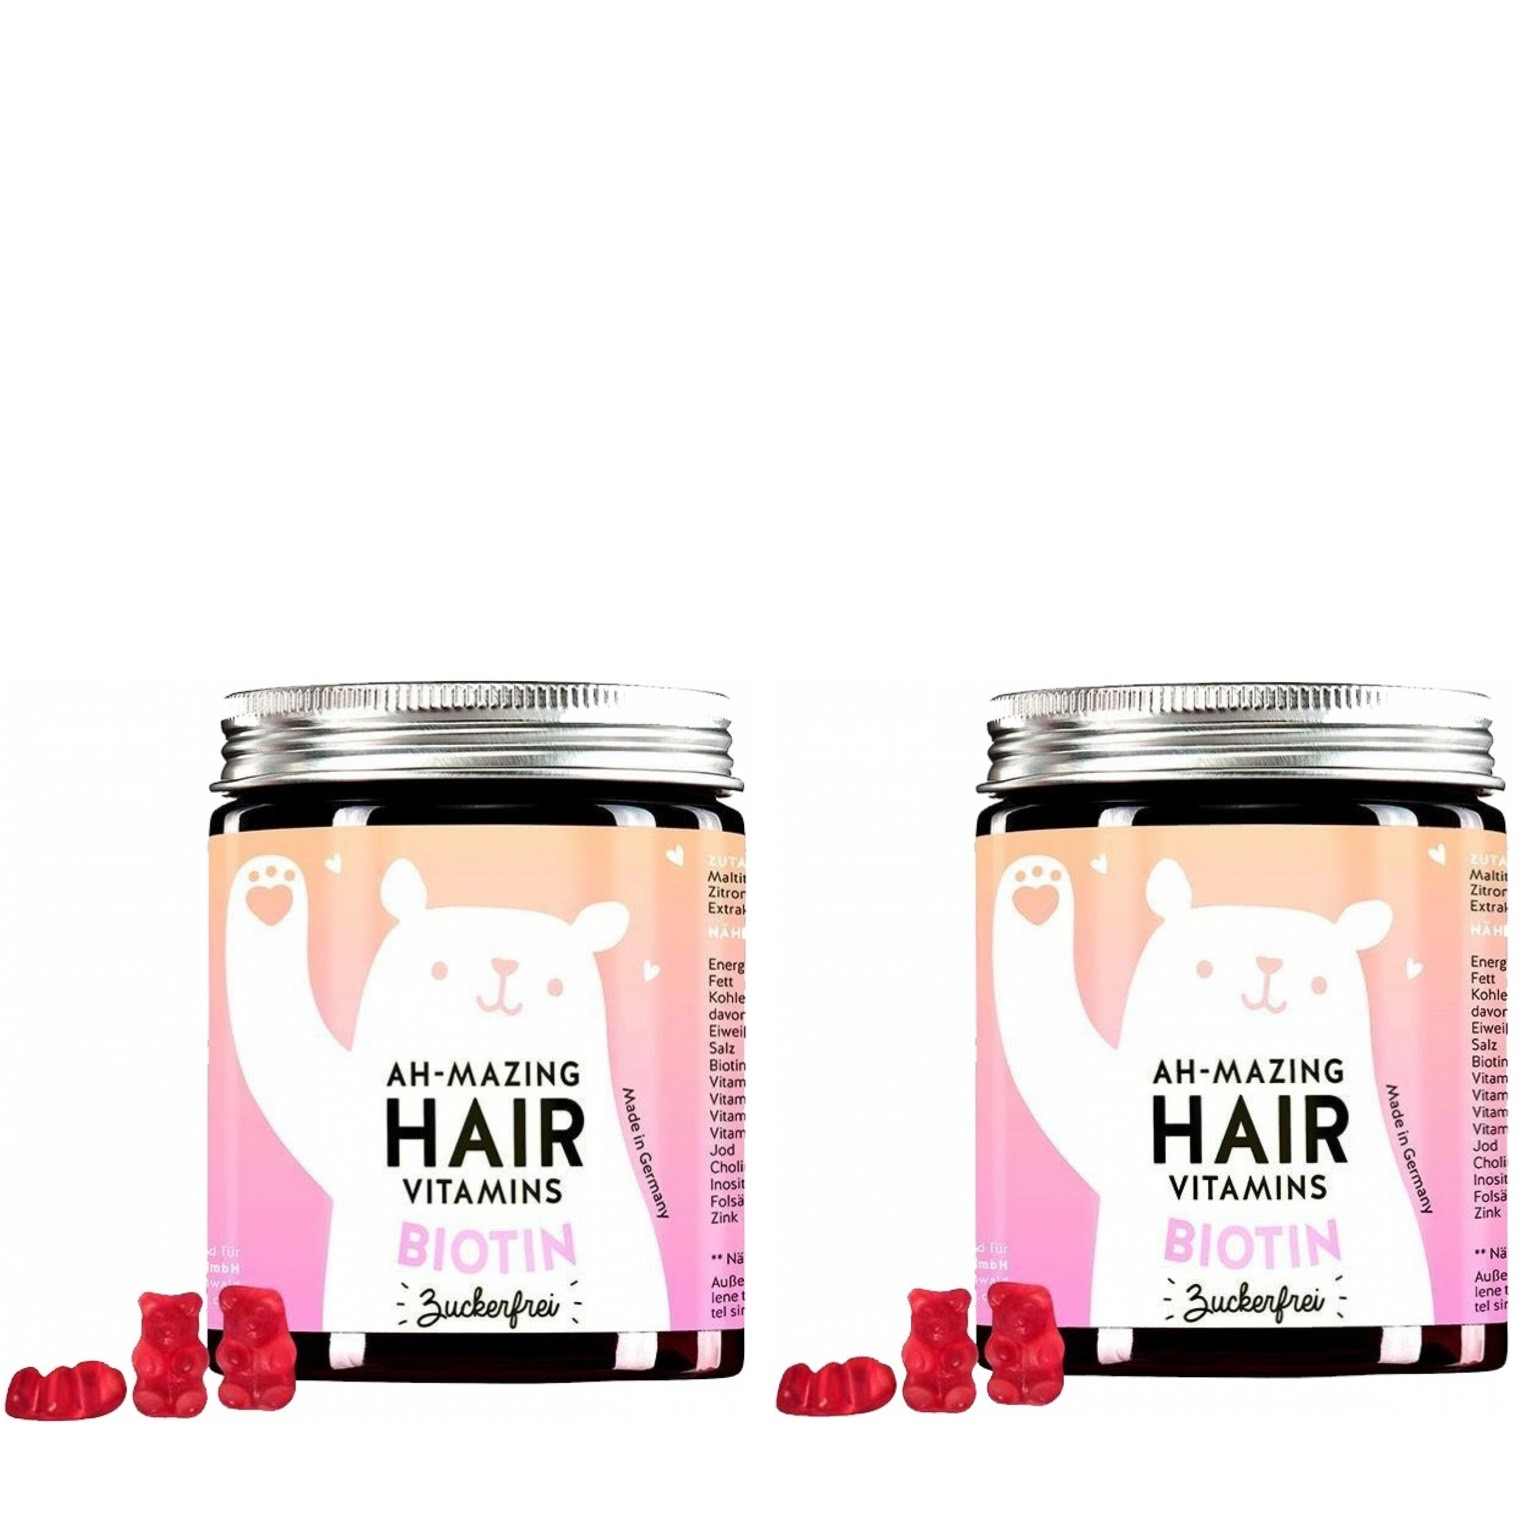 Bears with Benefits Ah-mazing Hair Vitamin mit Biotin zuckerfrei Duo (120 Stück)